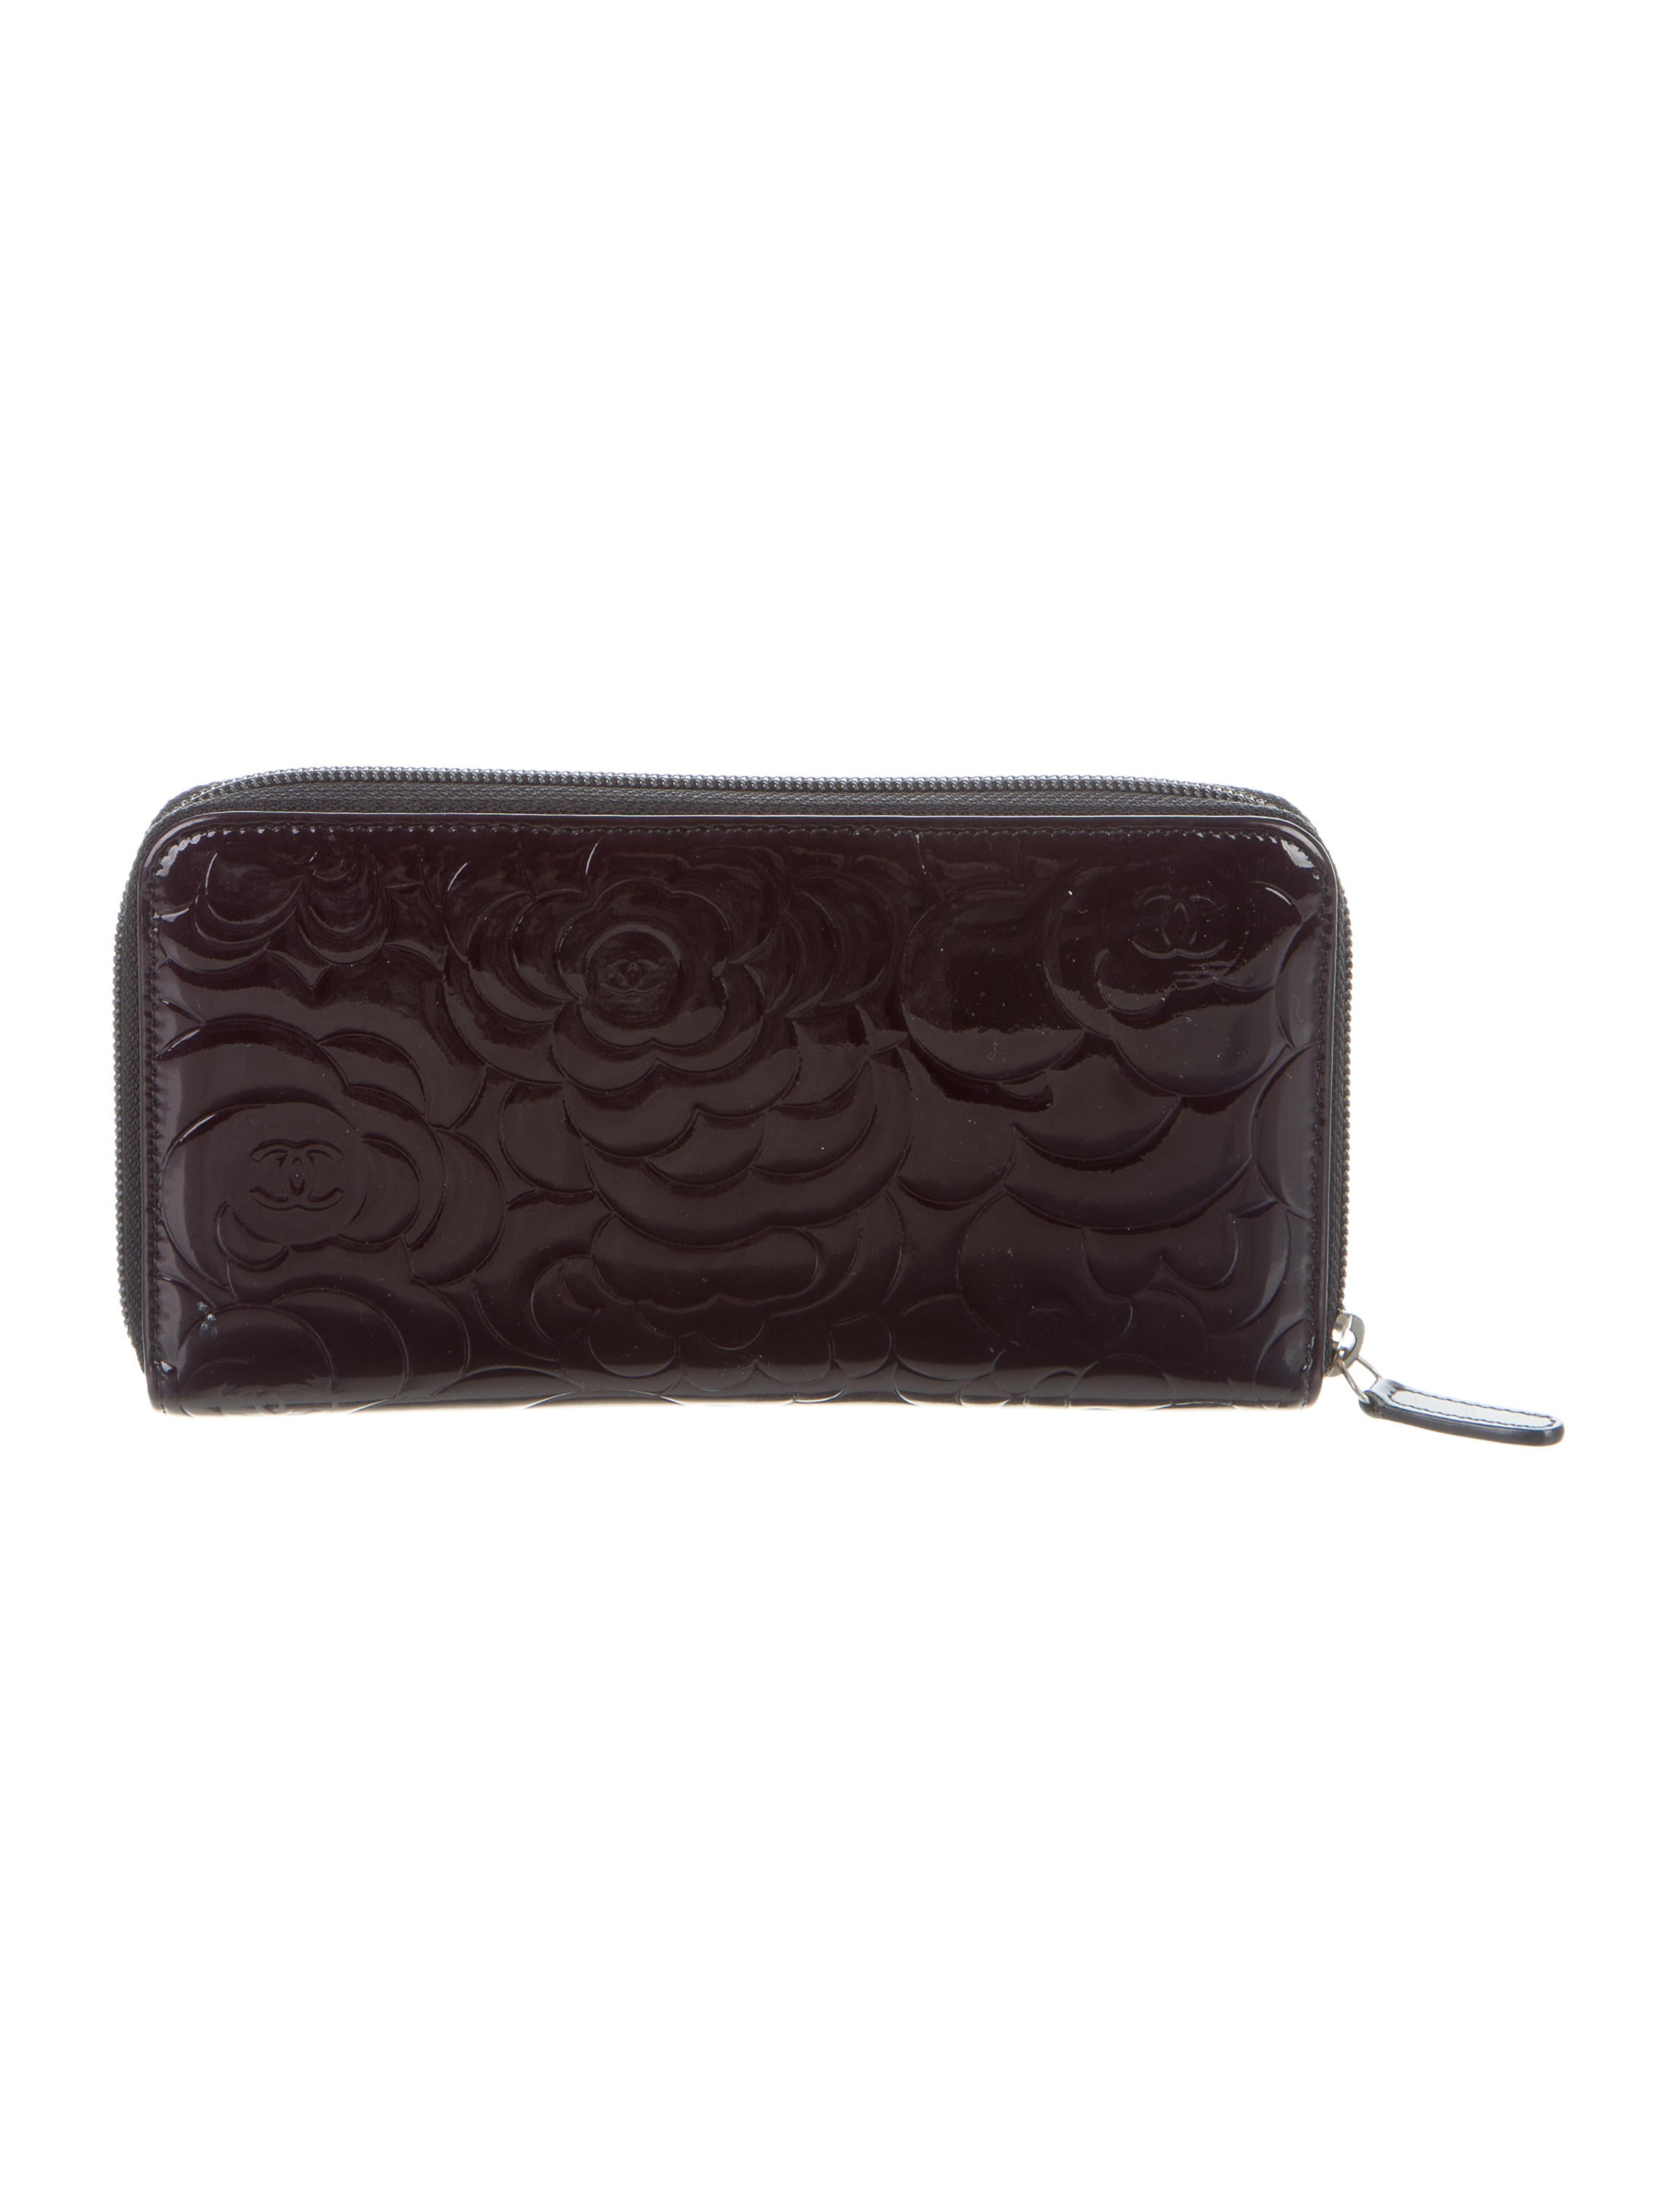 Chanel Camellia Zip Around Wallet - Accessories ...